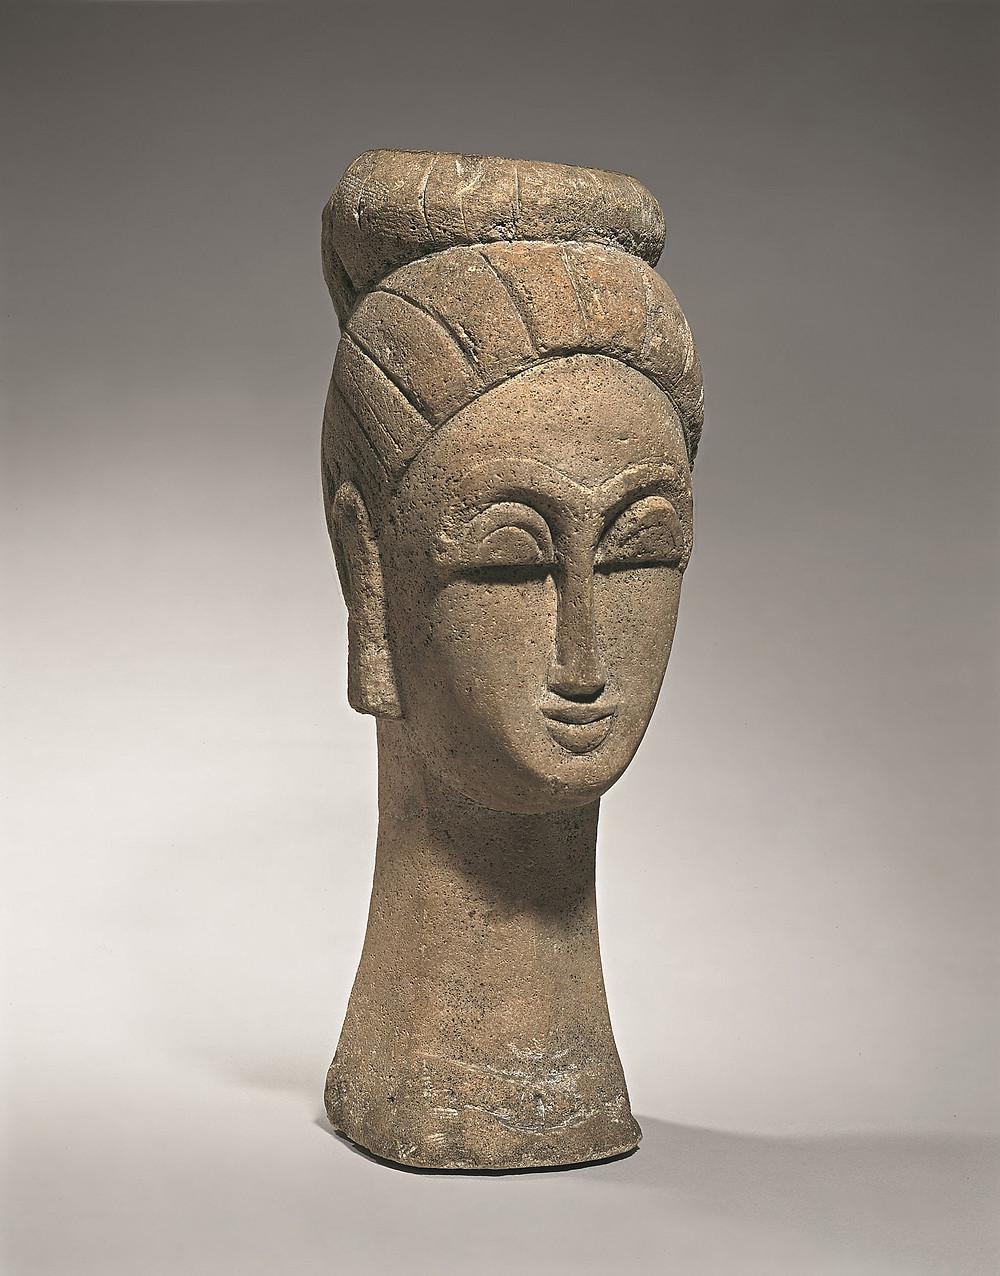 Sculpture of female head